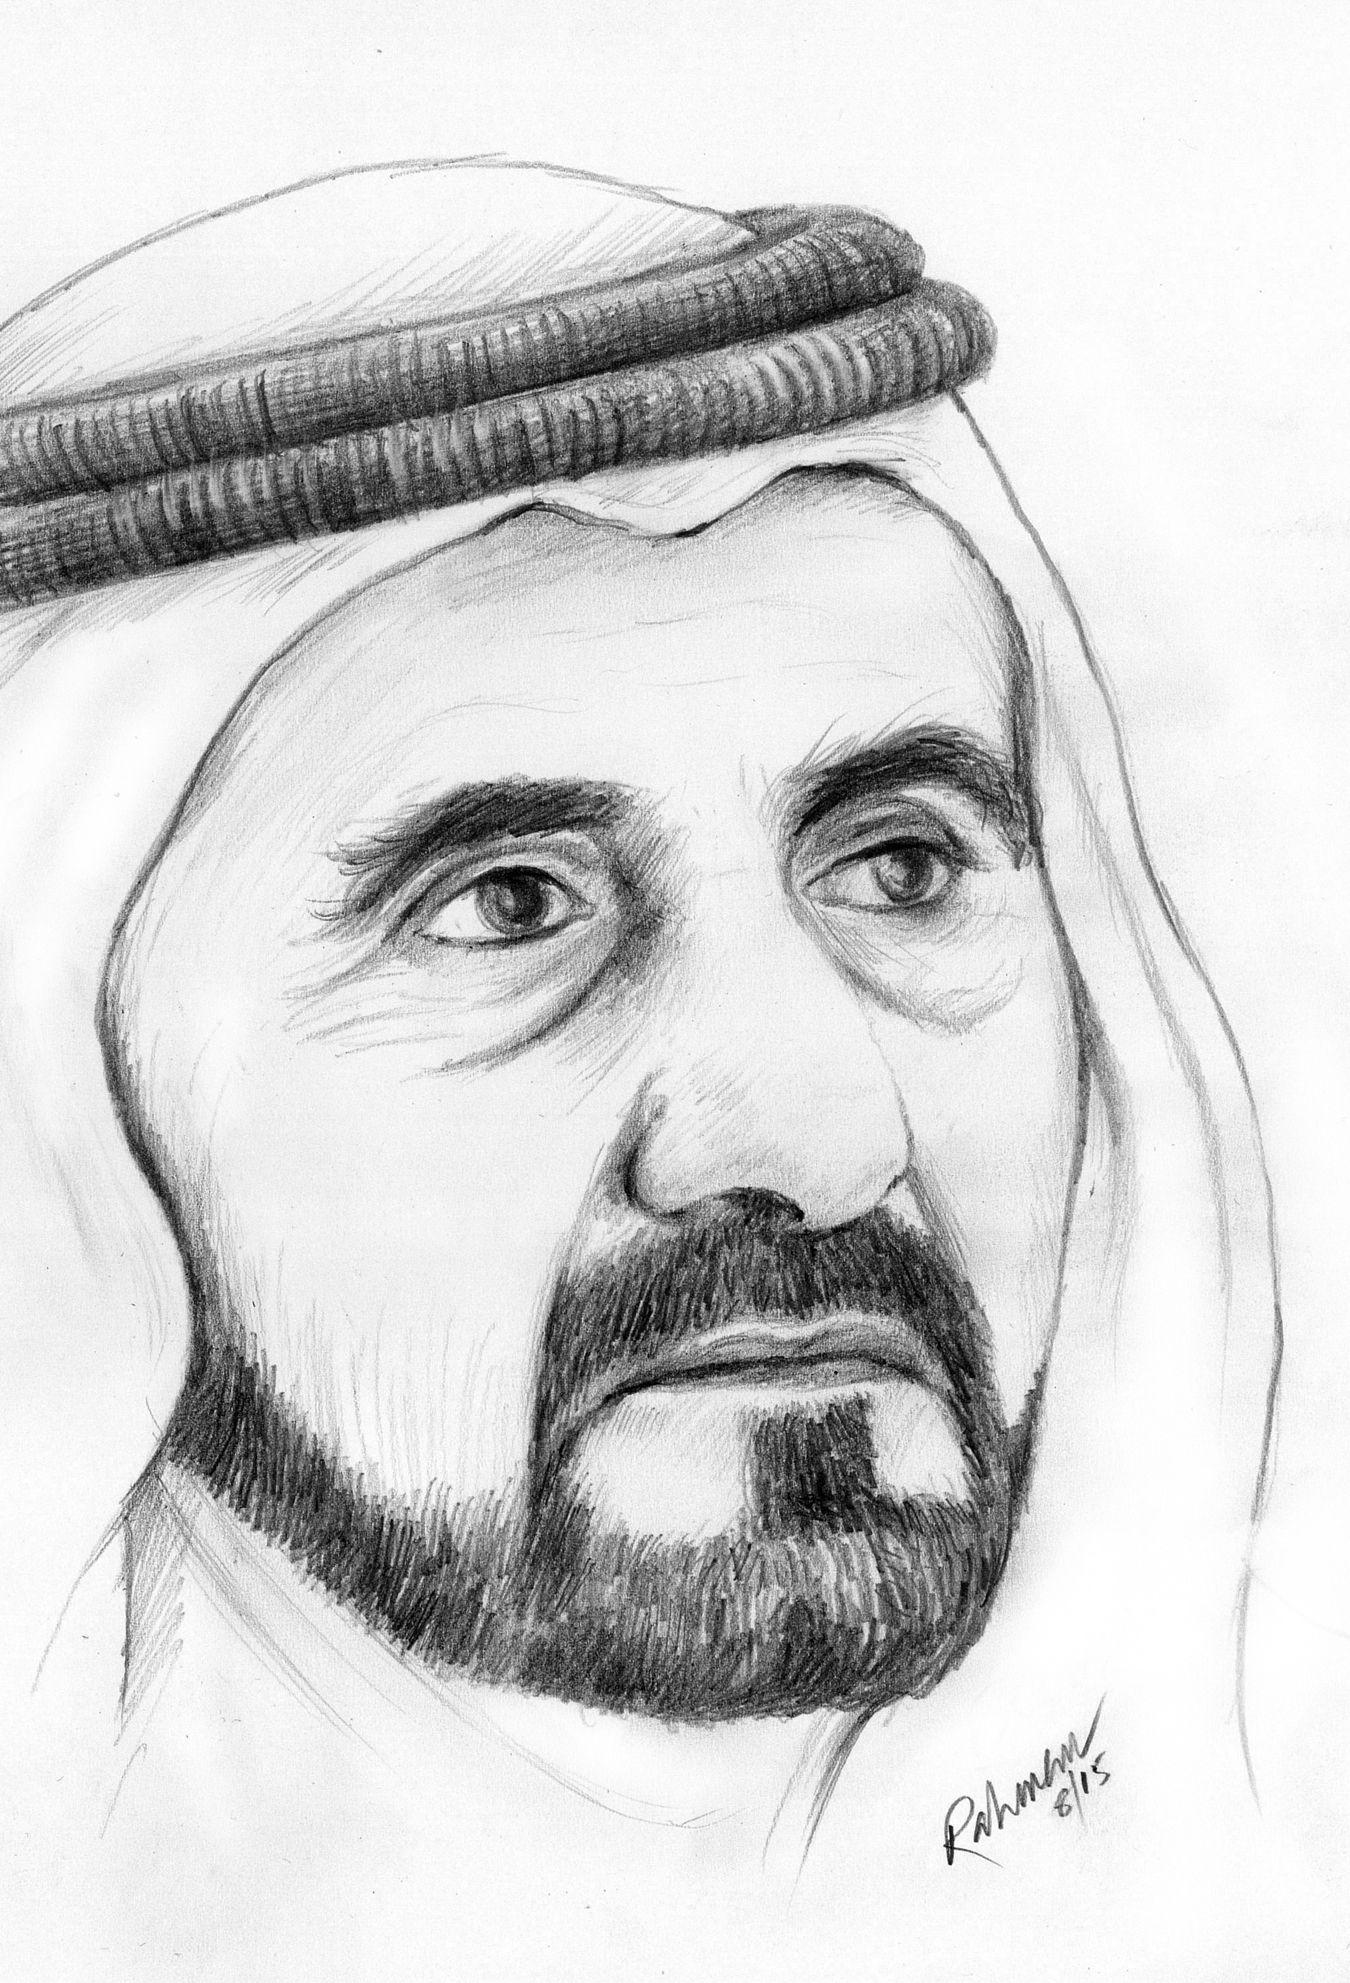 Pencil sketch of hh sheikh mohammed bin rashid al maktoum sheikh mohammed drawing my hero dubai